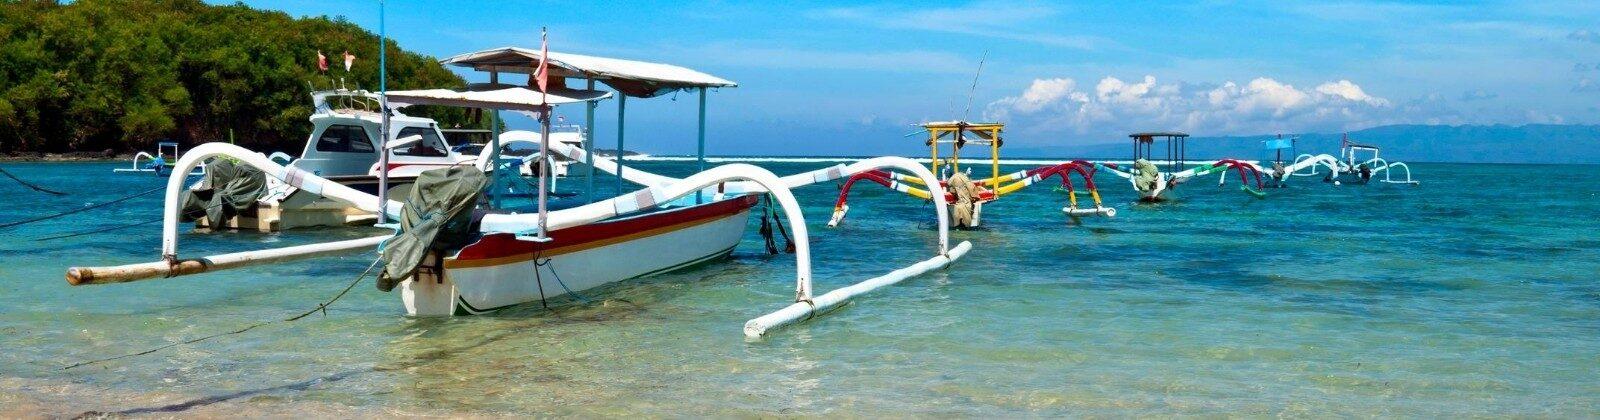 boats off of gili islands